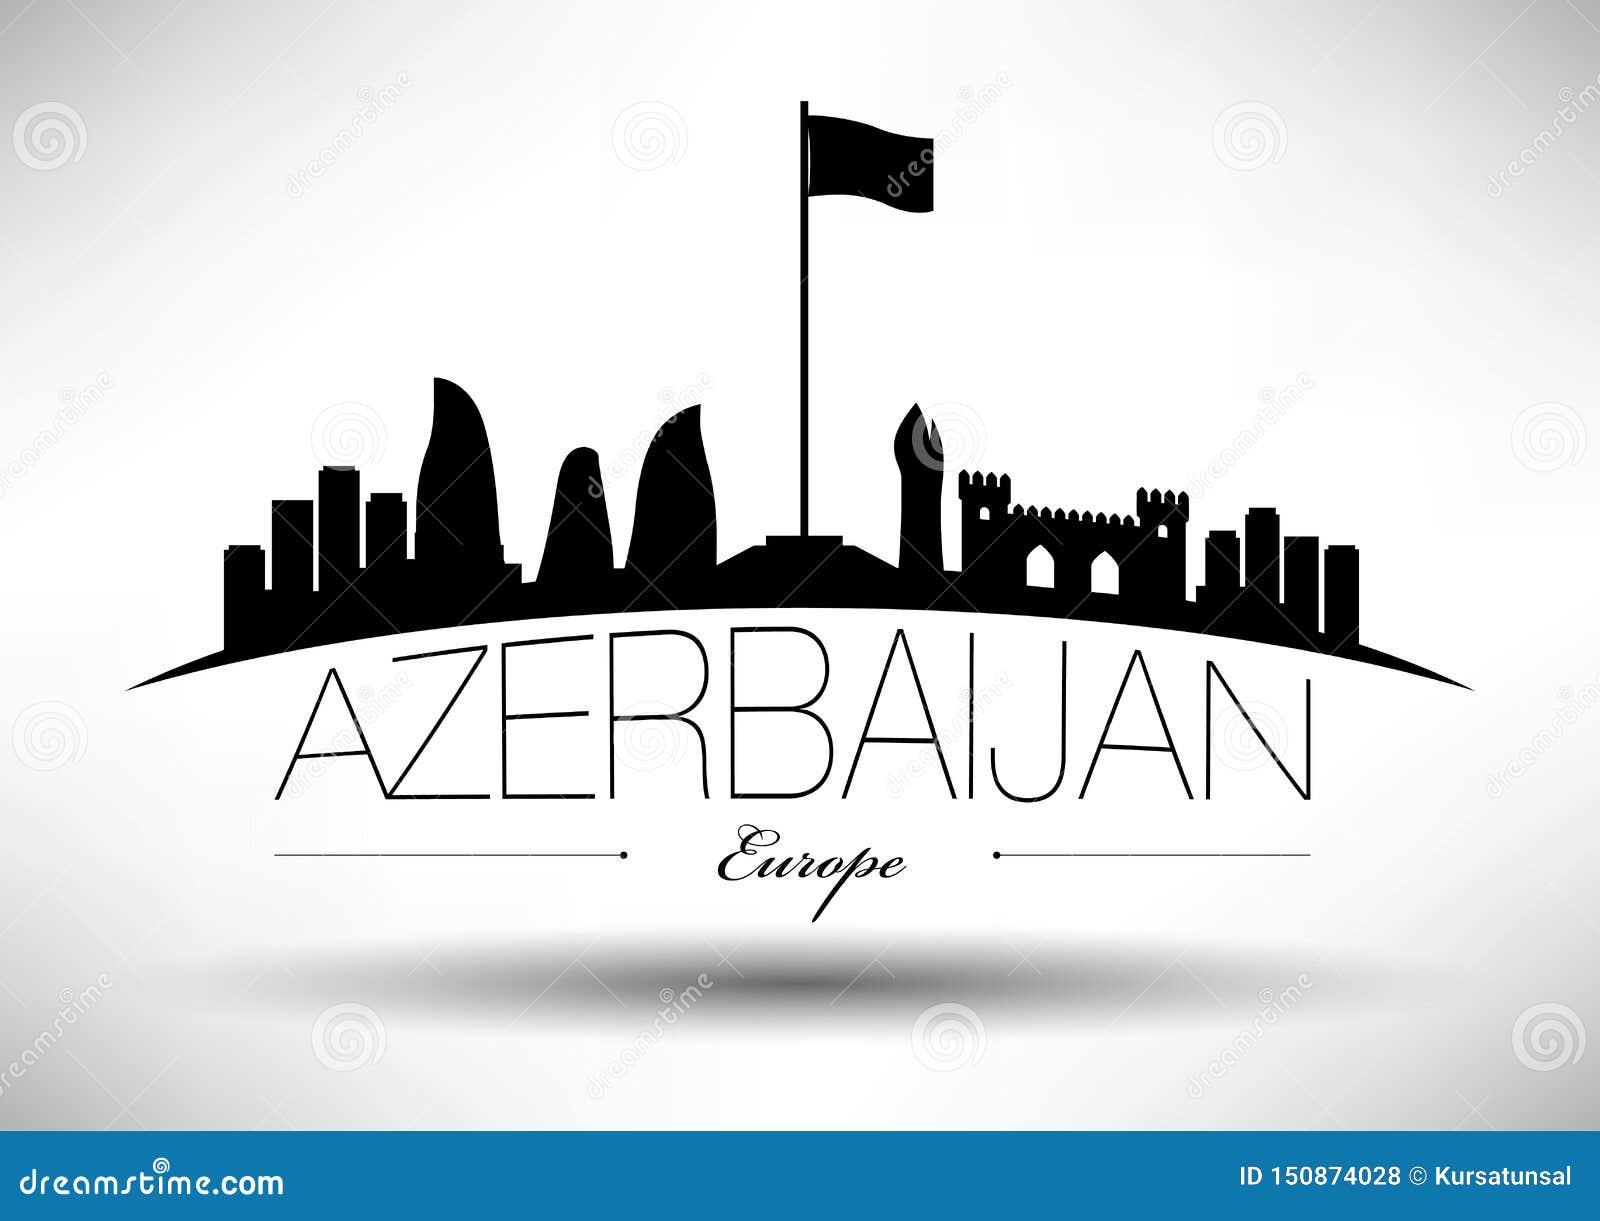 Azerbaijan Skyline with Typographic Design